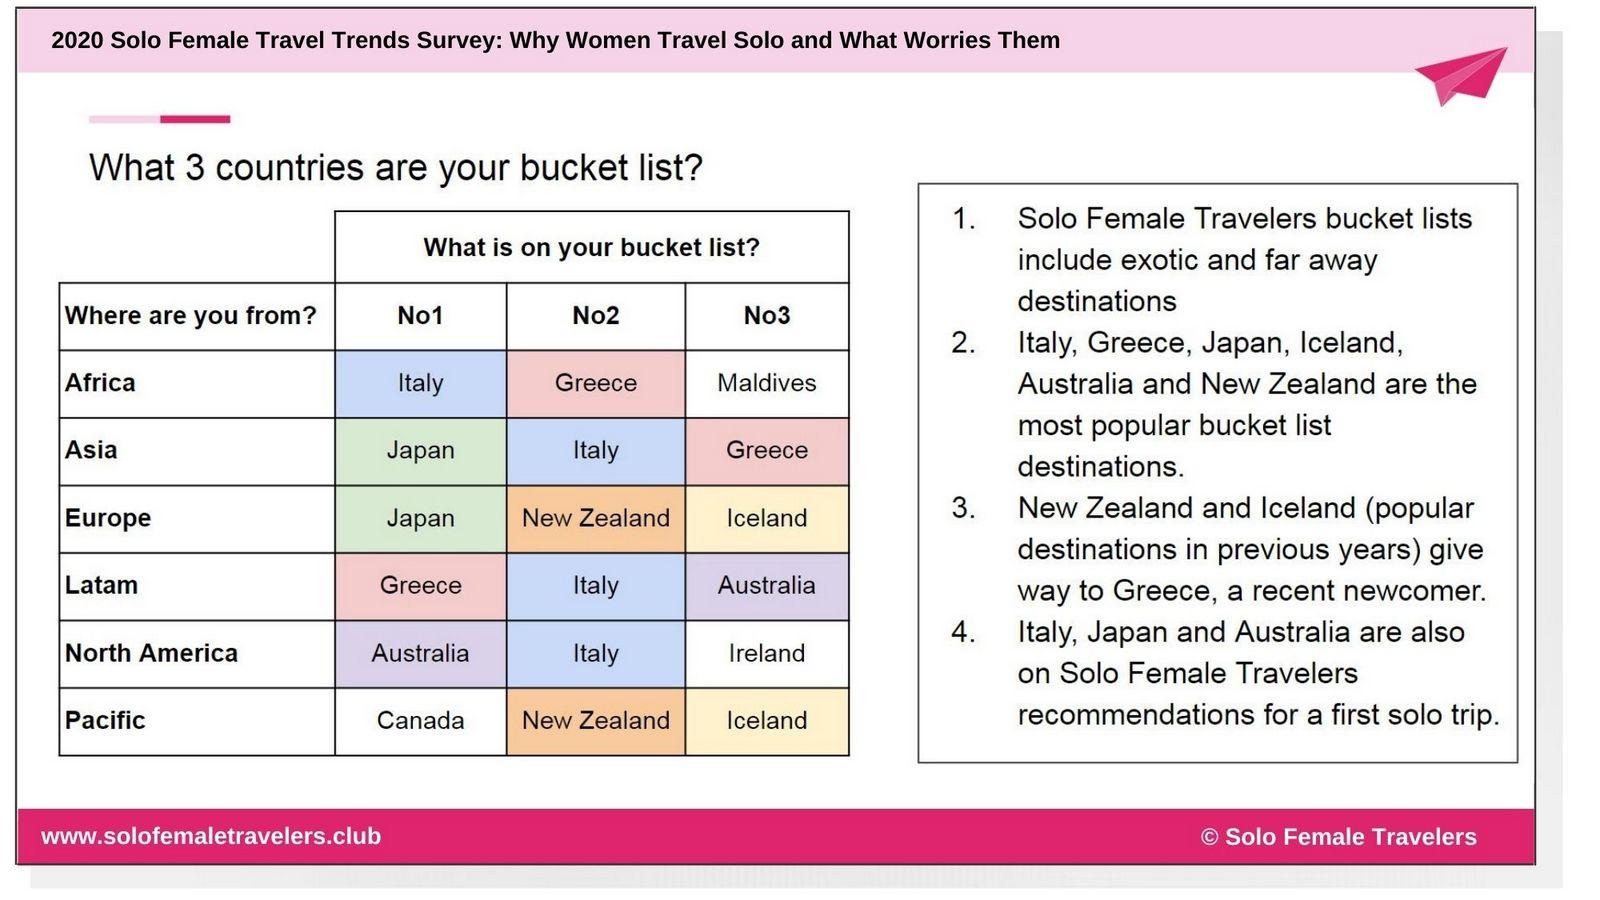 Bucketlist for Solo Female Travelers